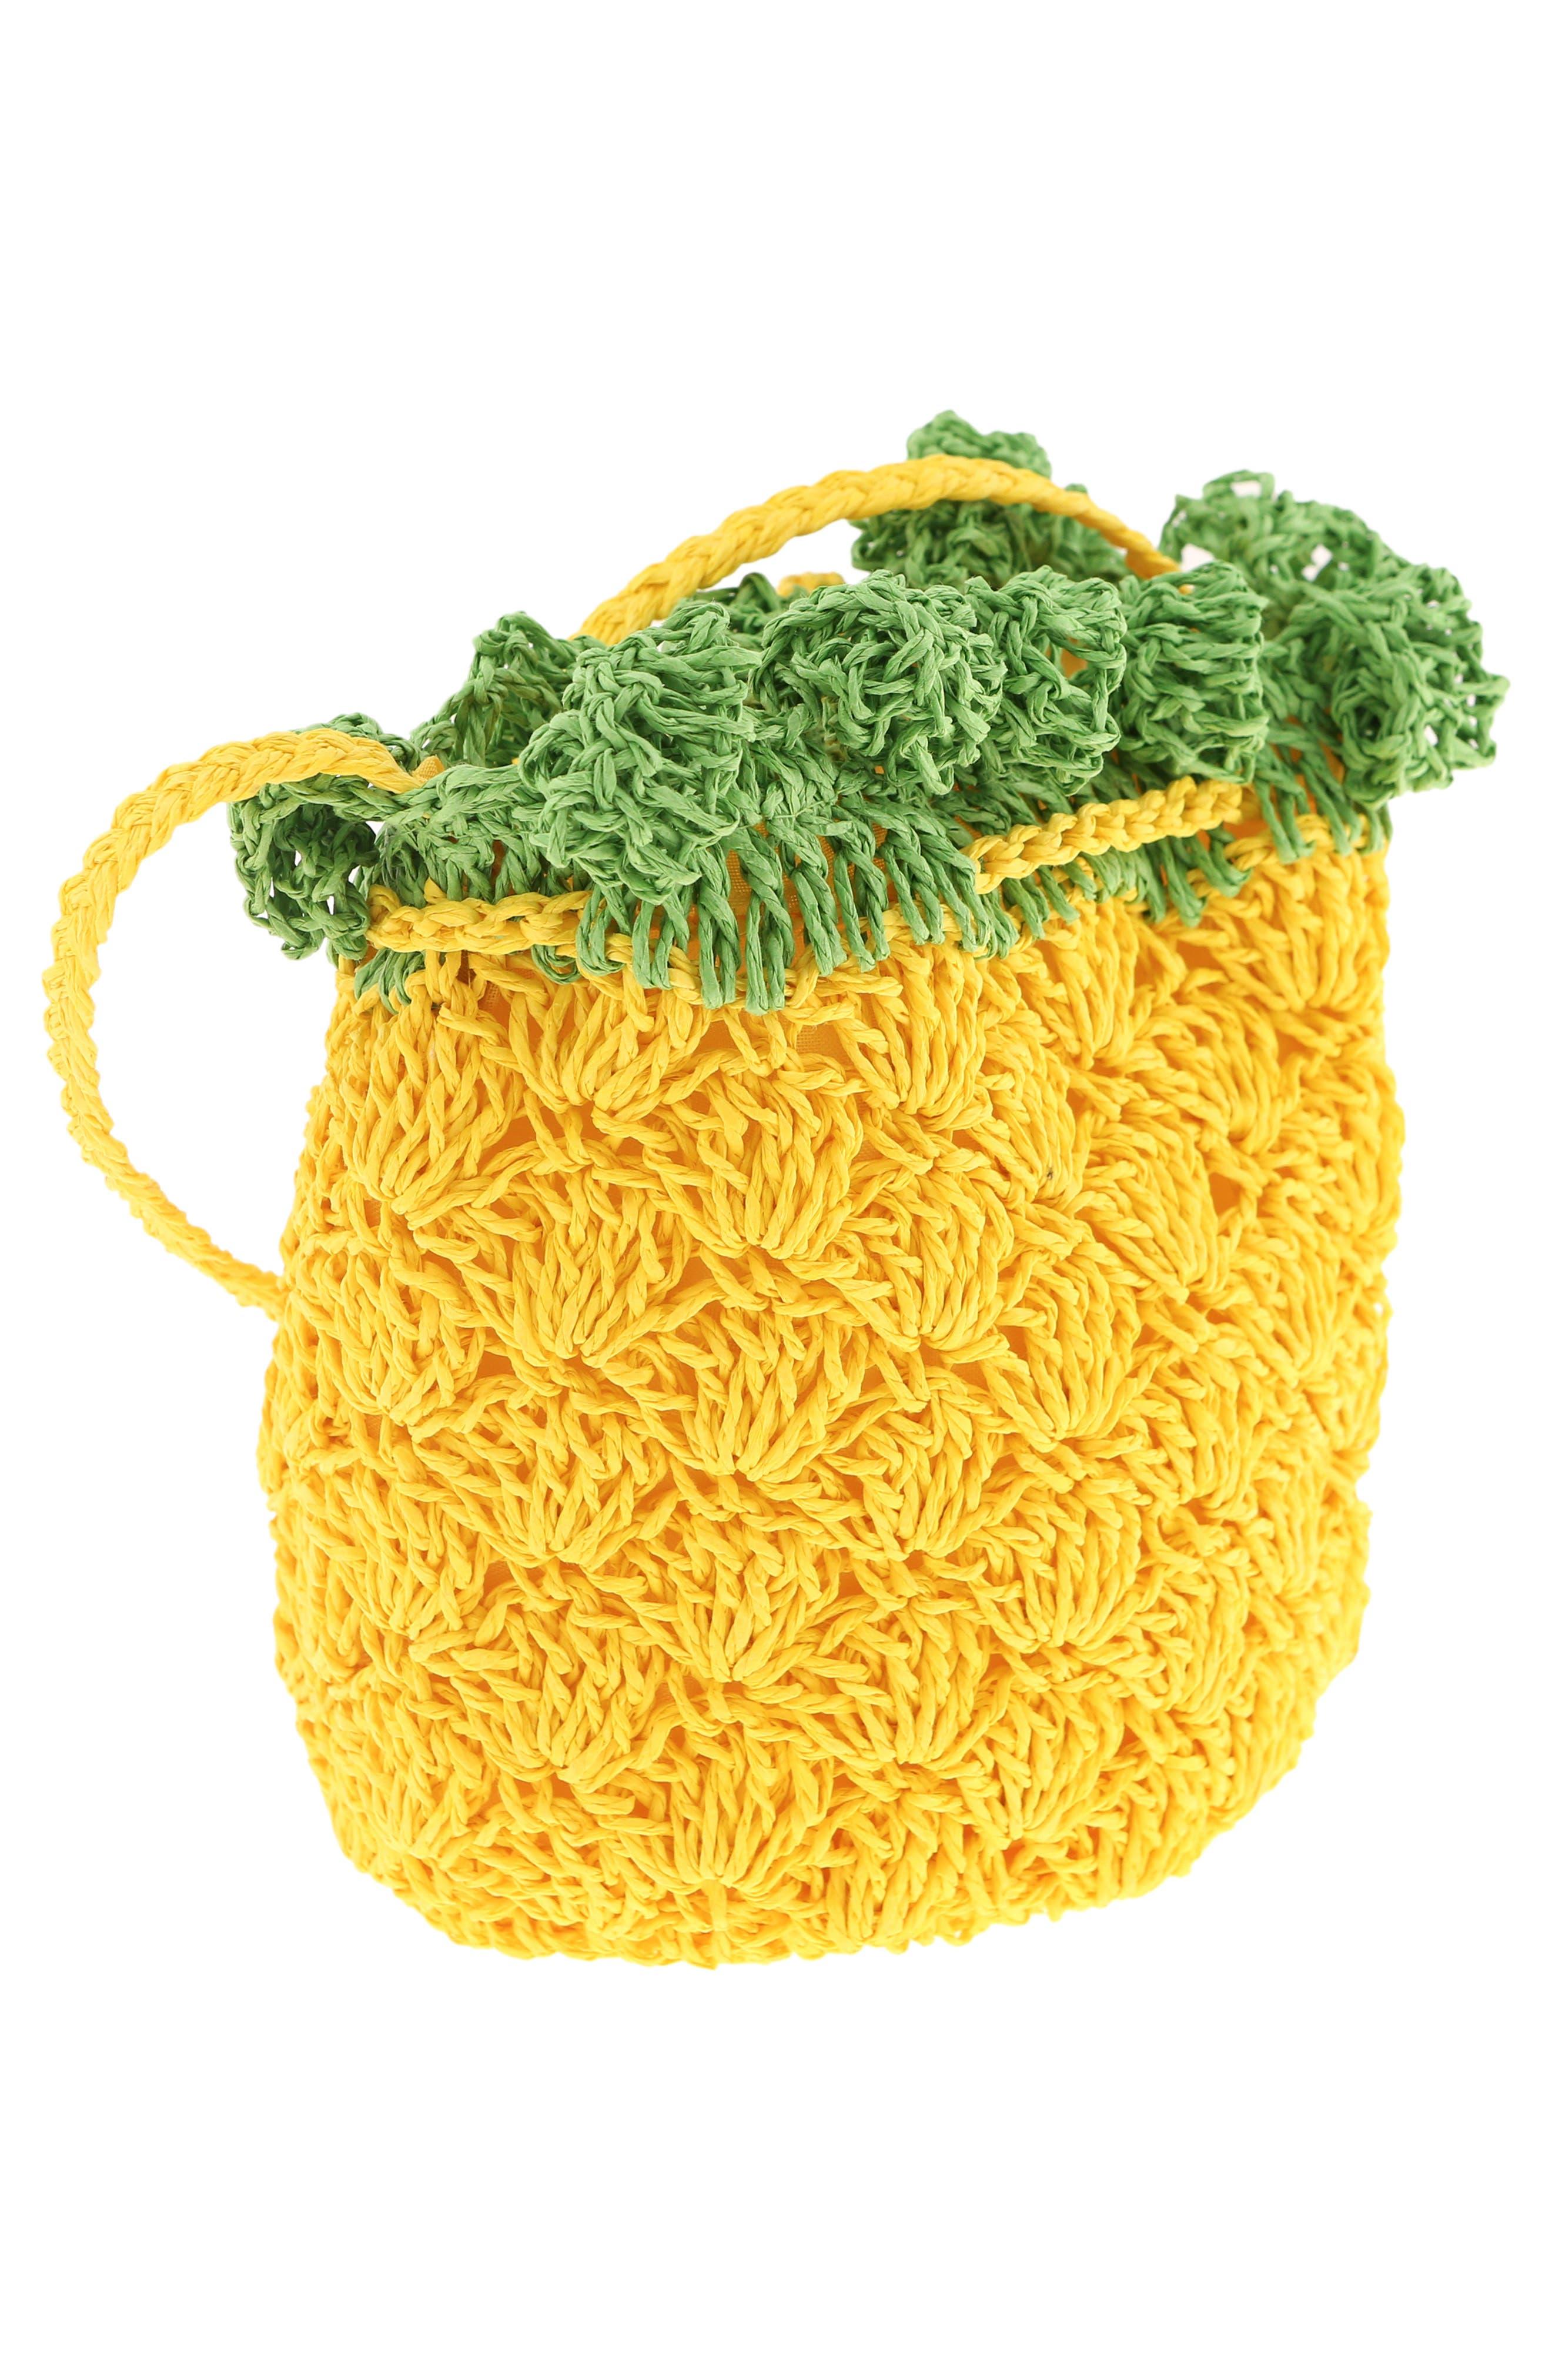 CAPELLI NEW YORK, Crochet Pineapple Crossbody Bag, Alternate thumbnail 2, color, YELLOW COMBO